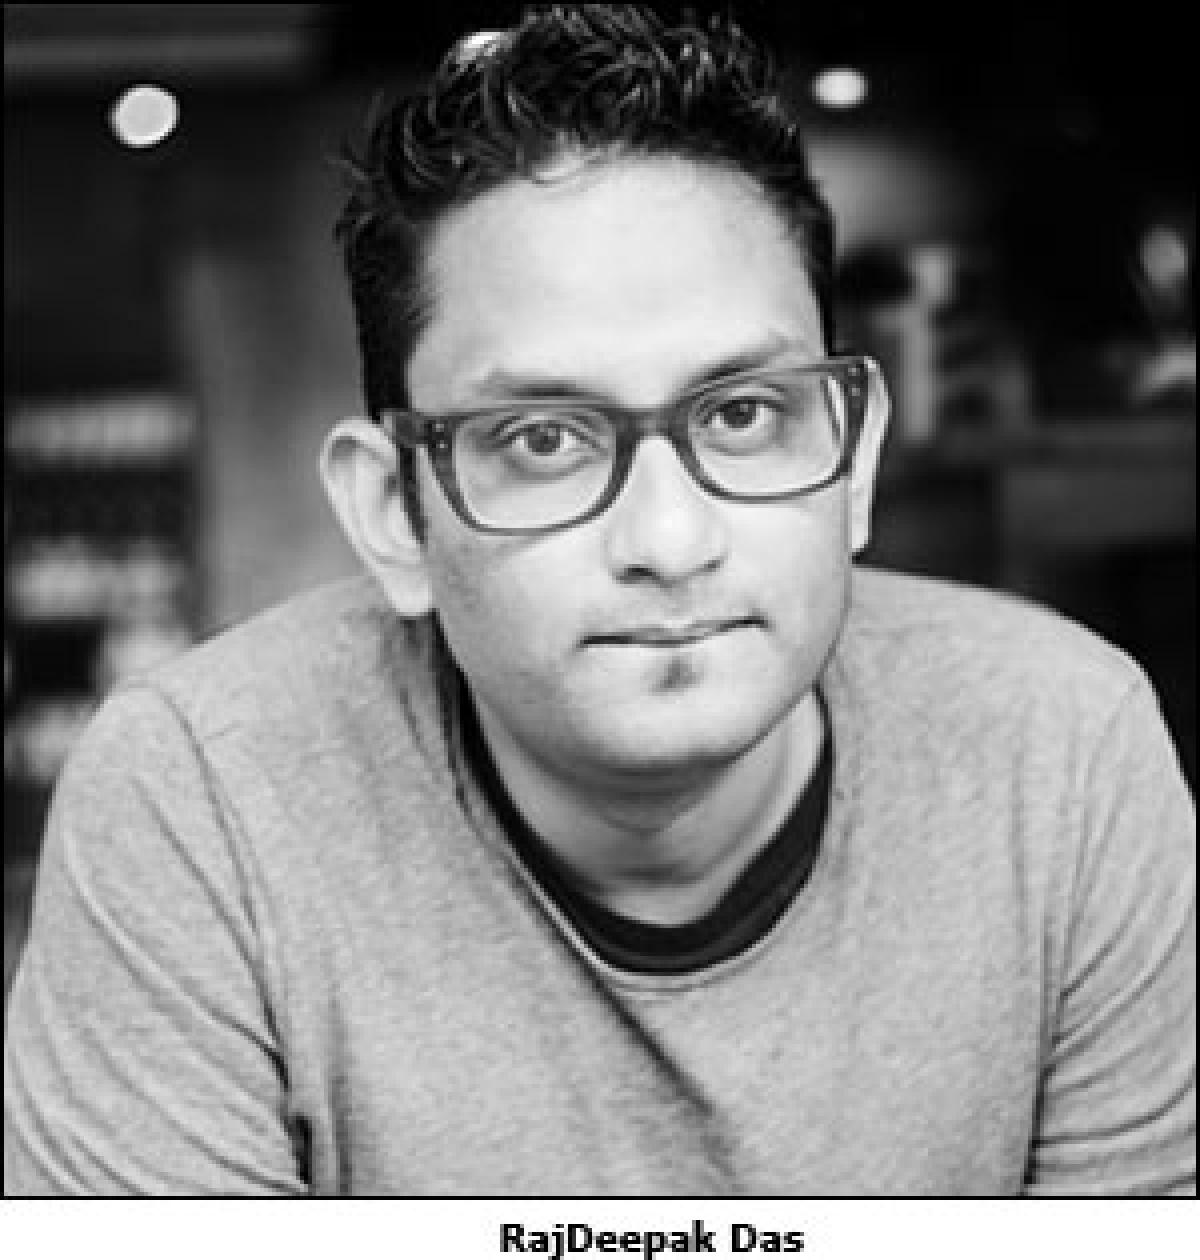 Leo Burnett appoints RajDeepak Das as chief creative officer